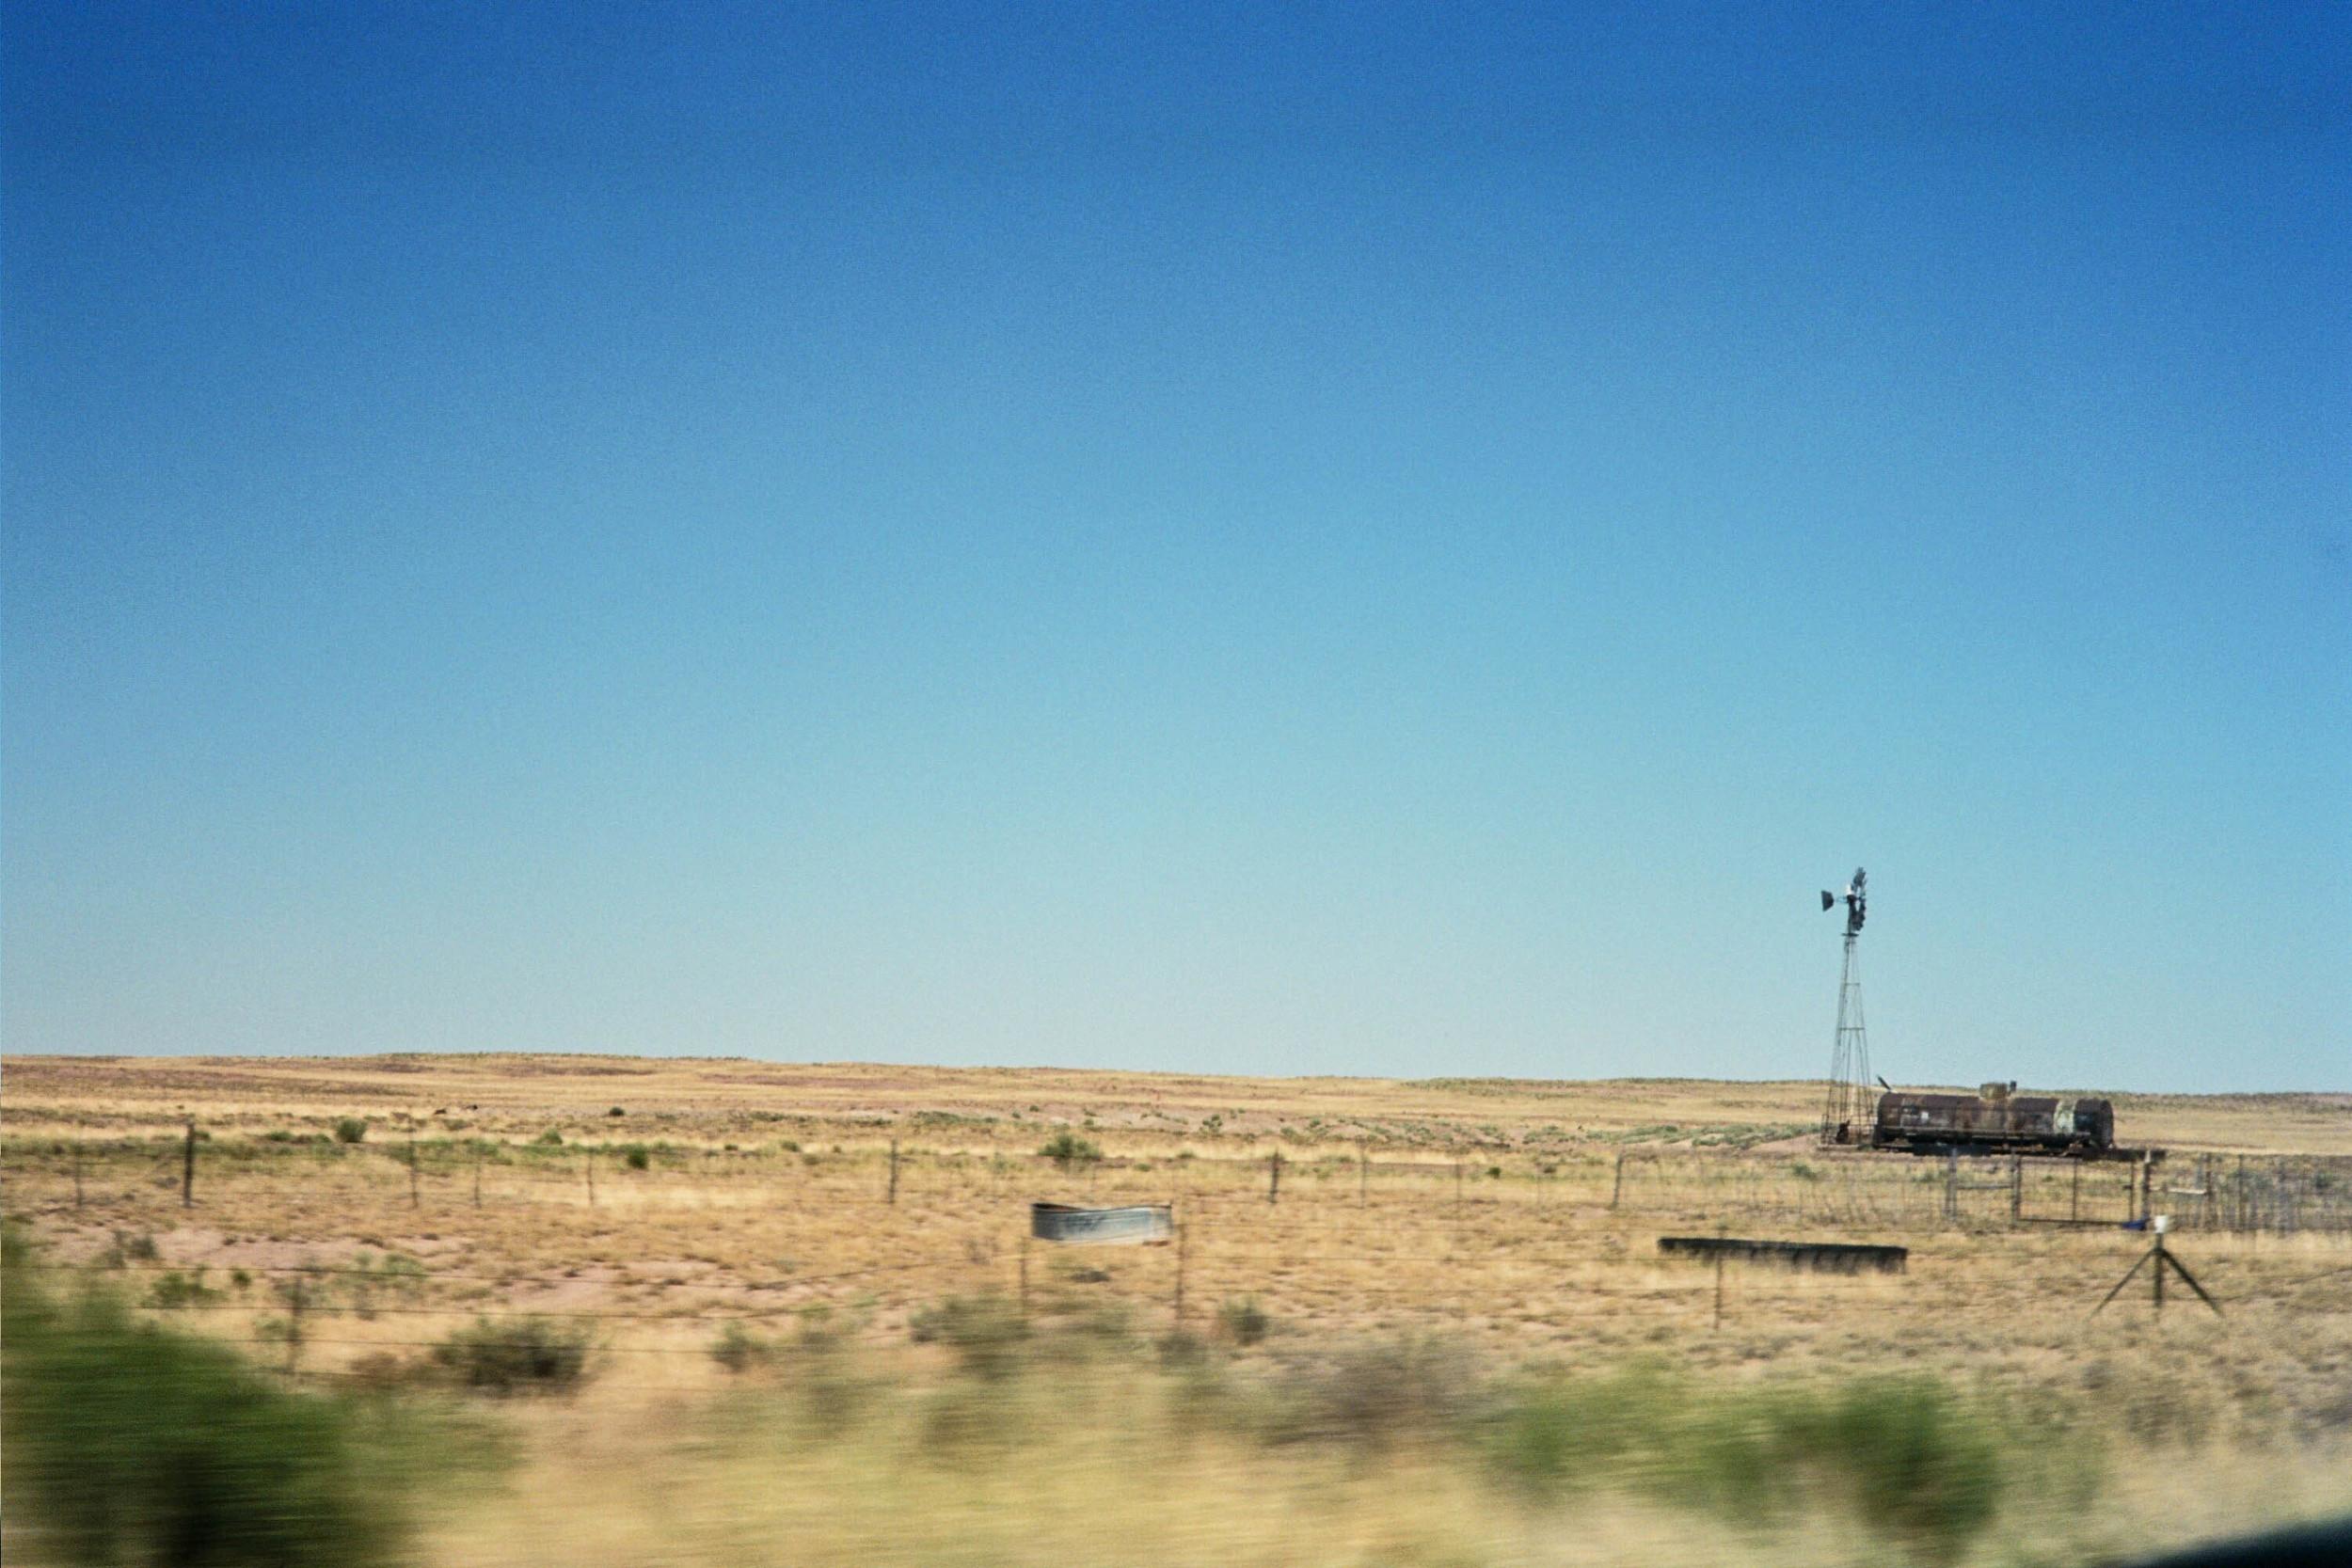 Heading East on the I-40, AZ